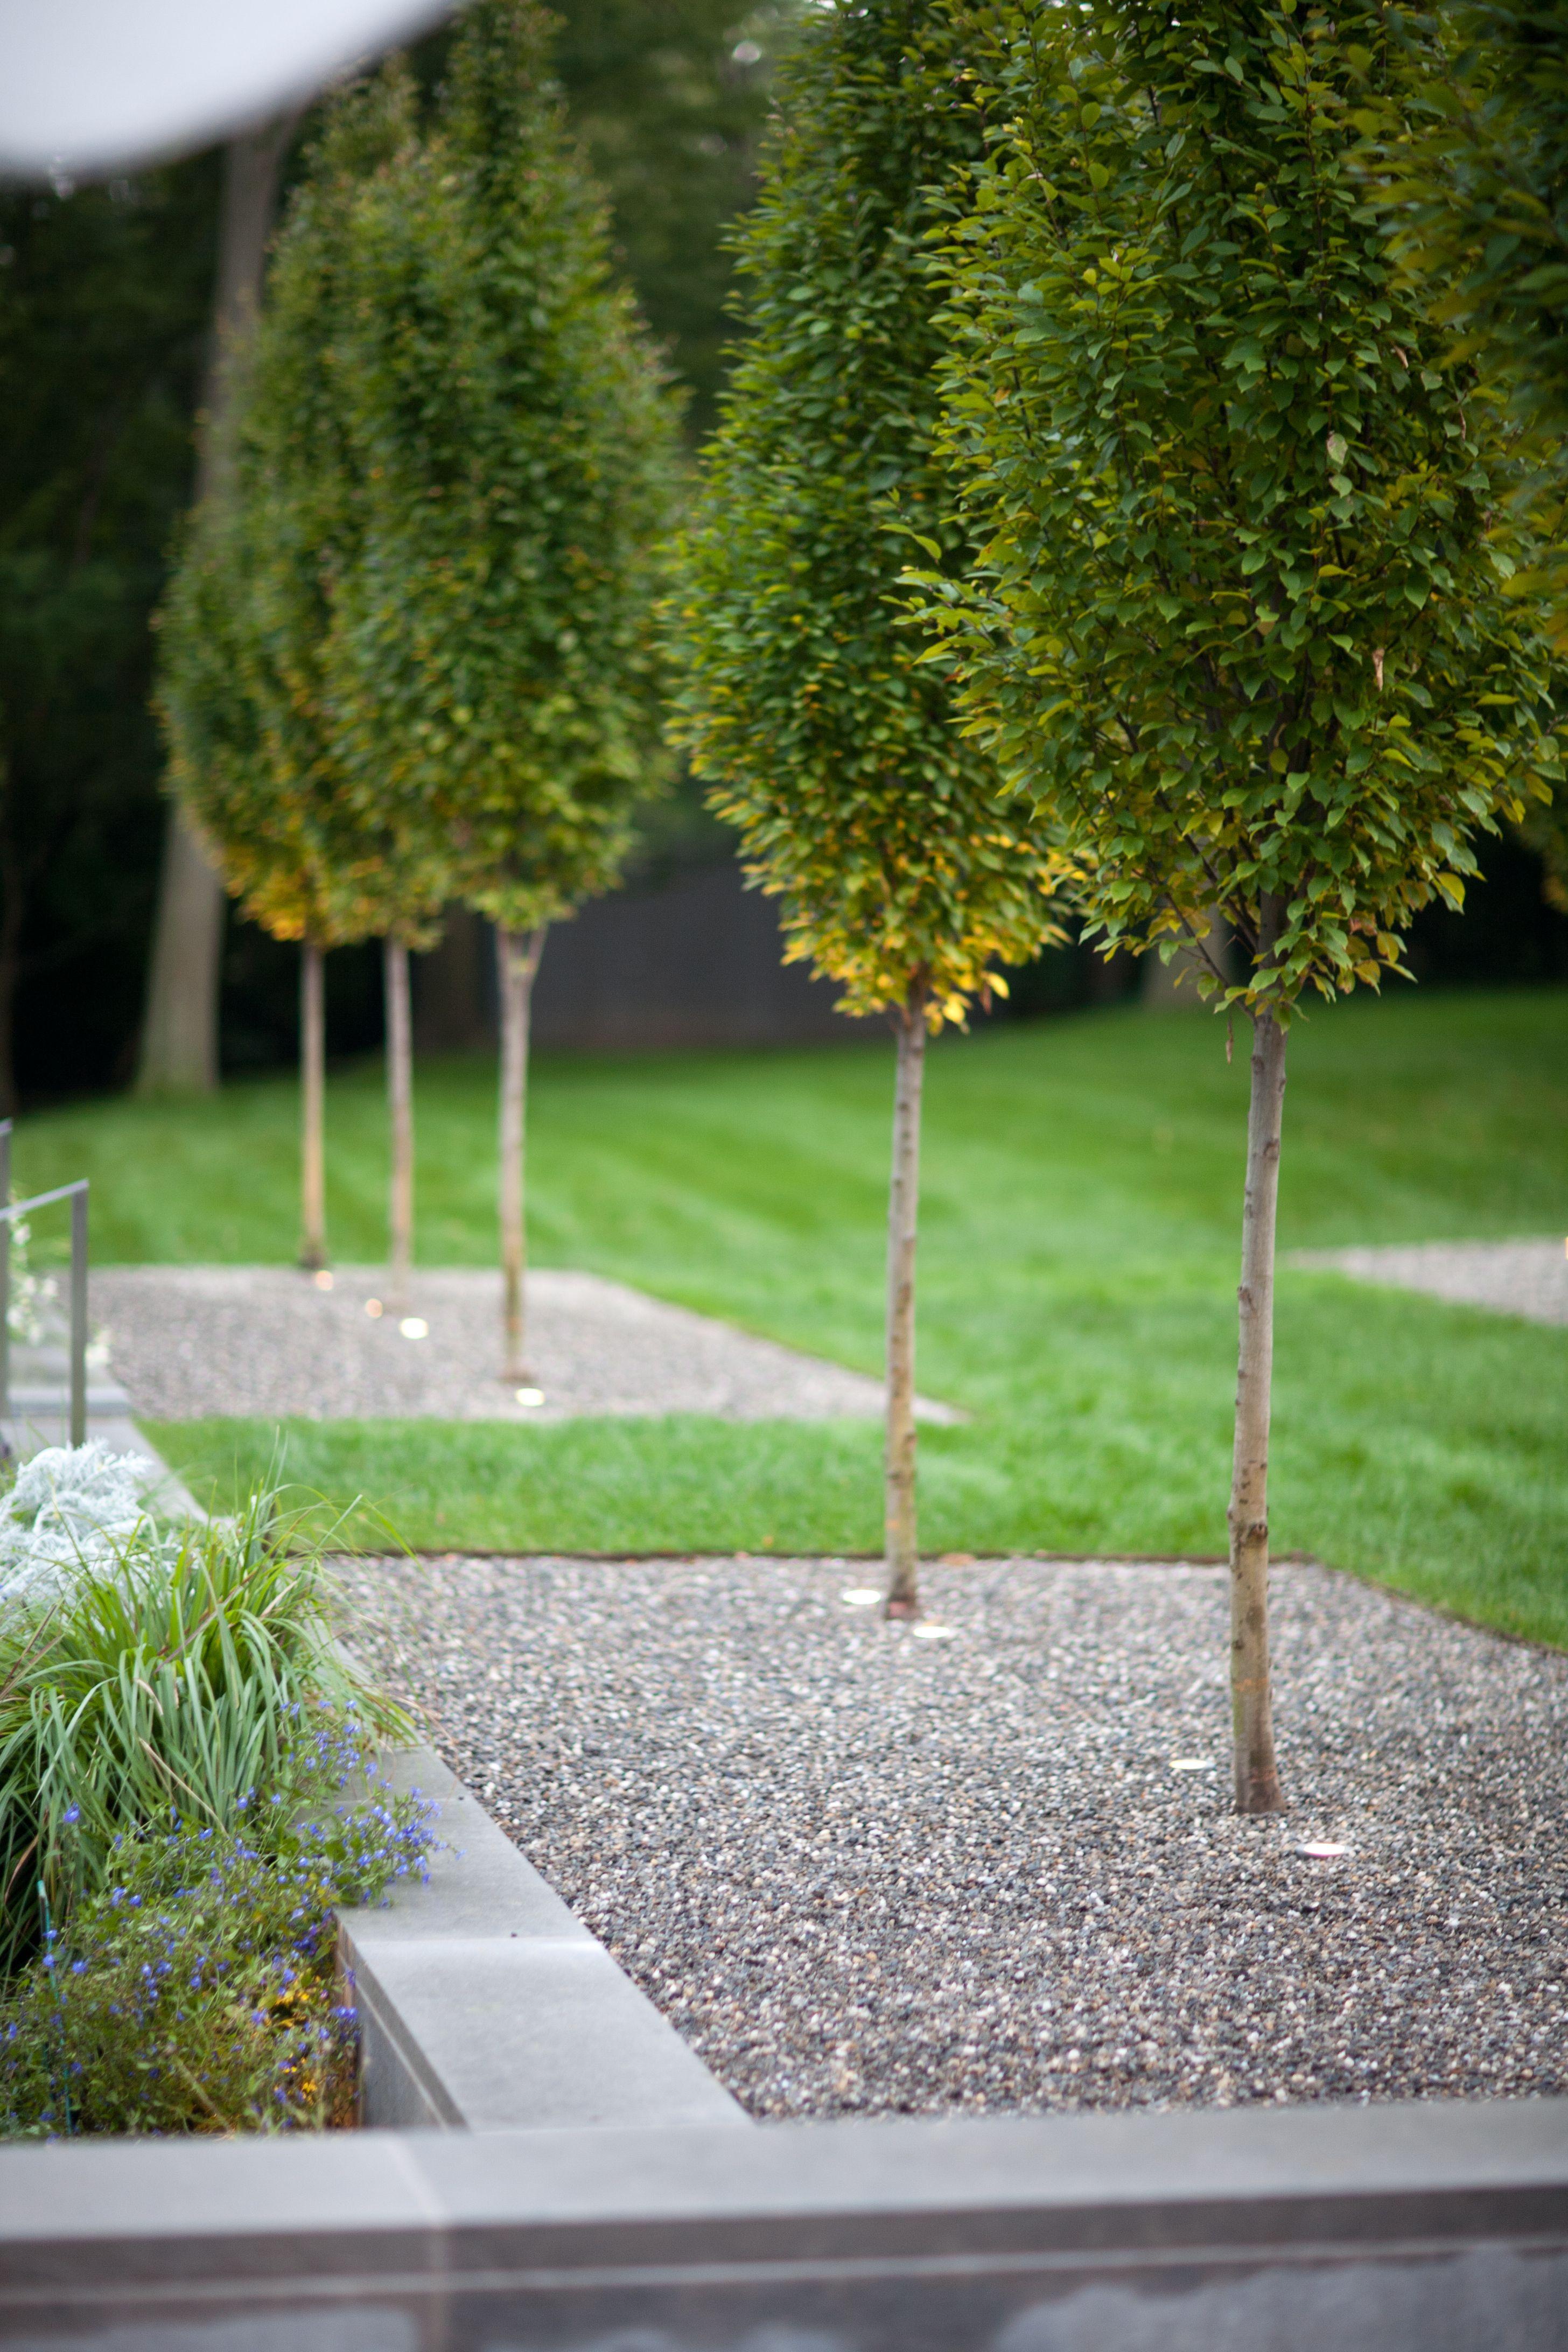 Jardin Moderne Avec Du Gravier D Coratif Galets Et Plantes Landscape Designs And Landscaping